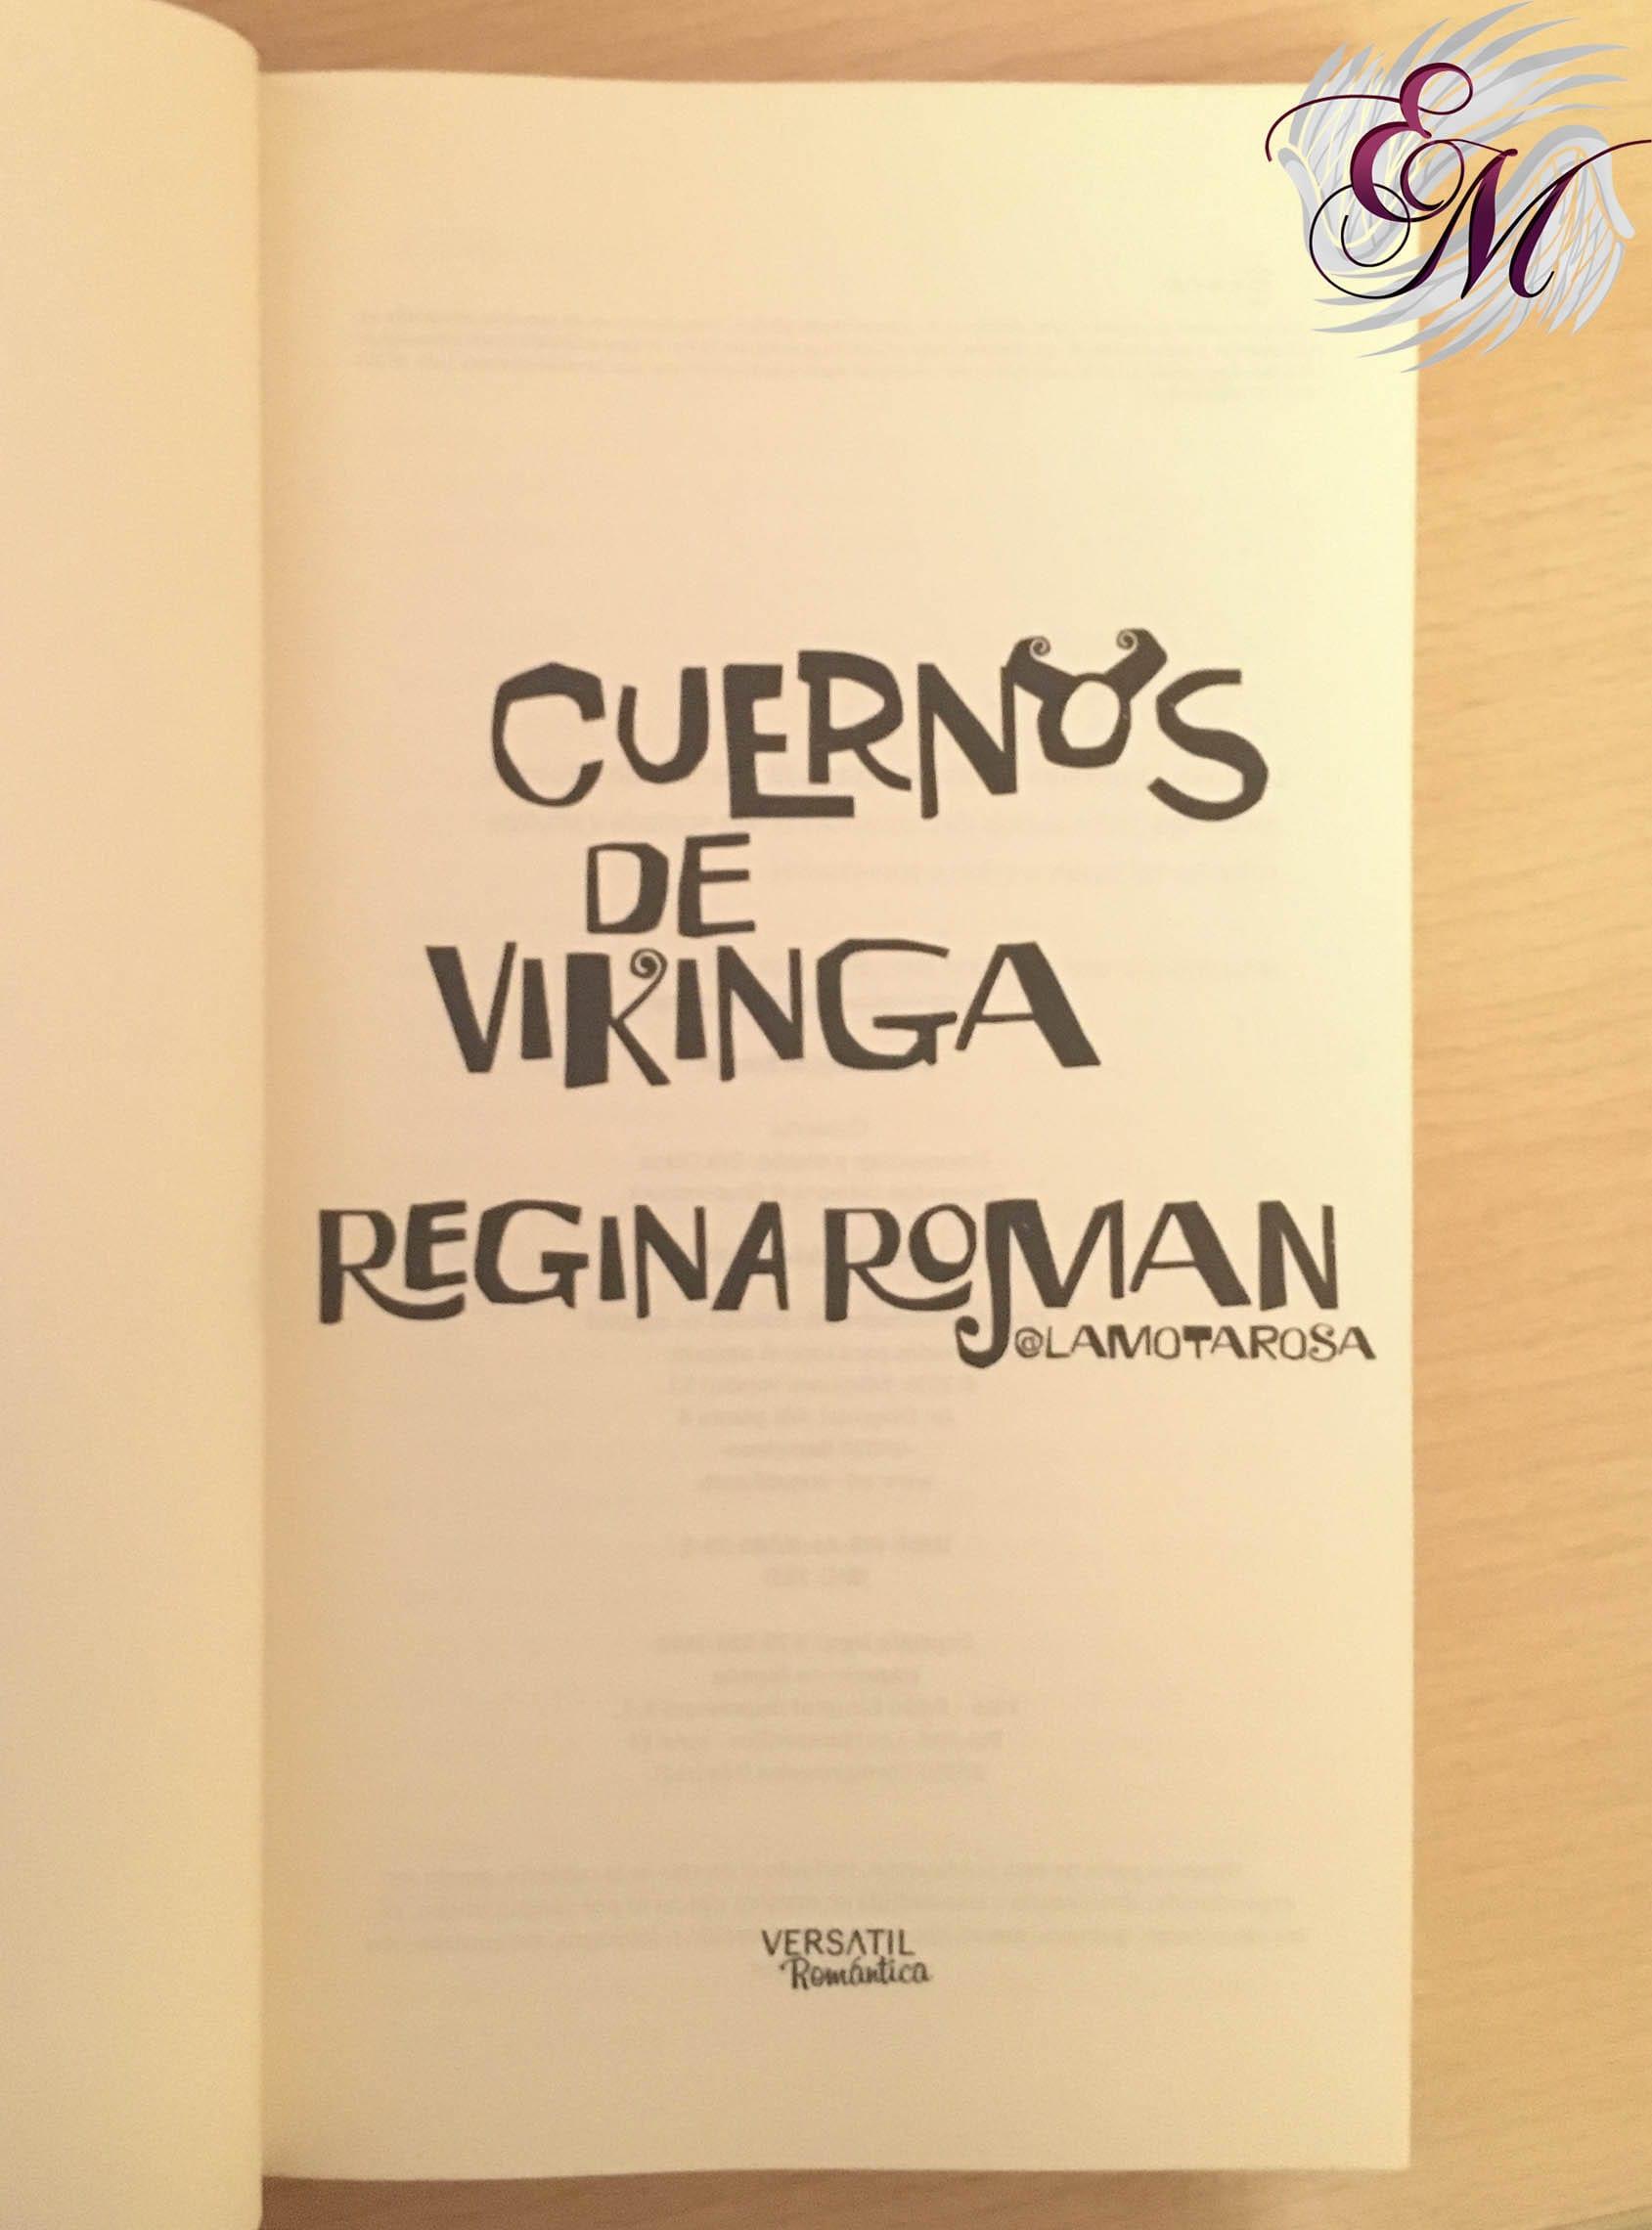 Cuernos de vikinga, de Regina Roman - Reseña